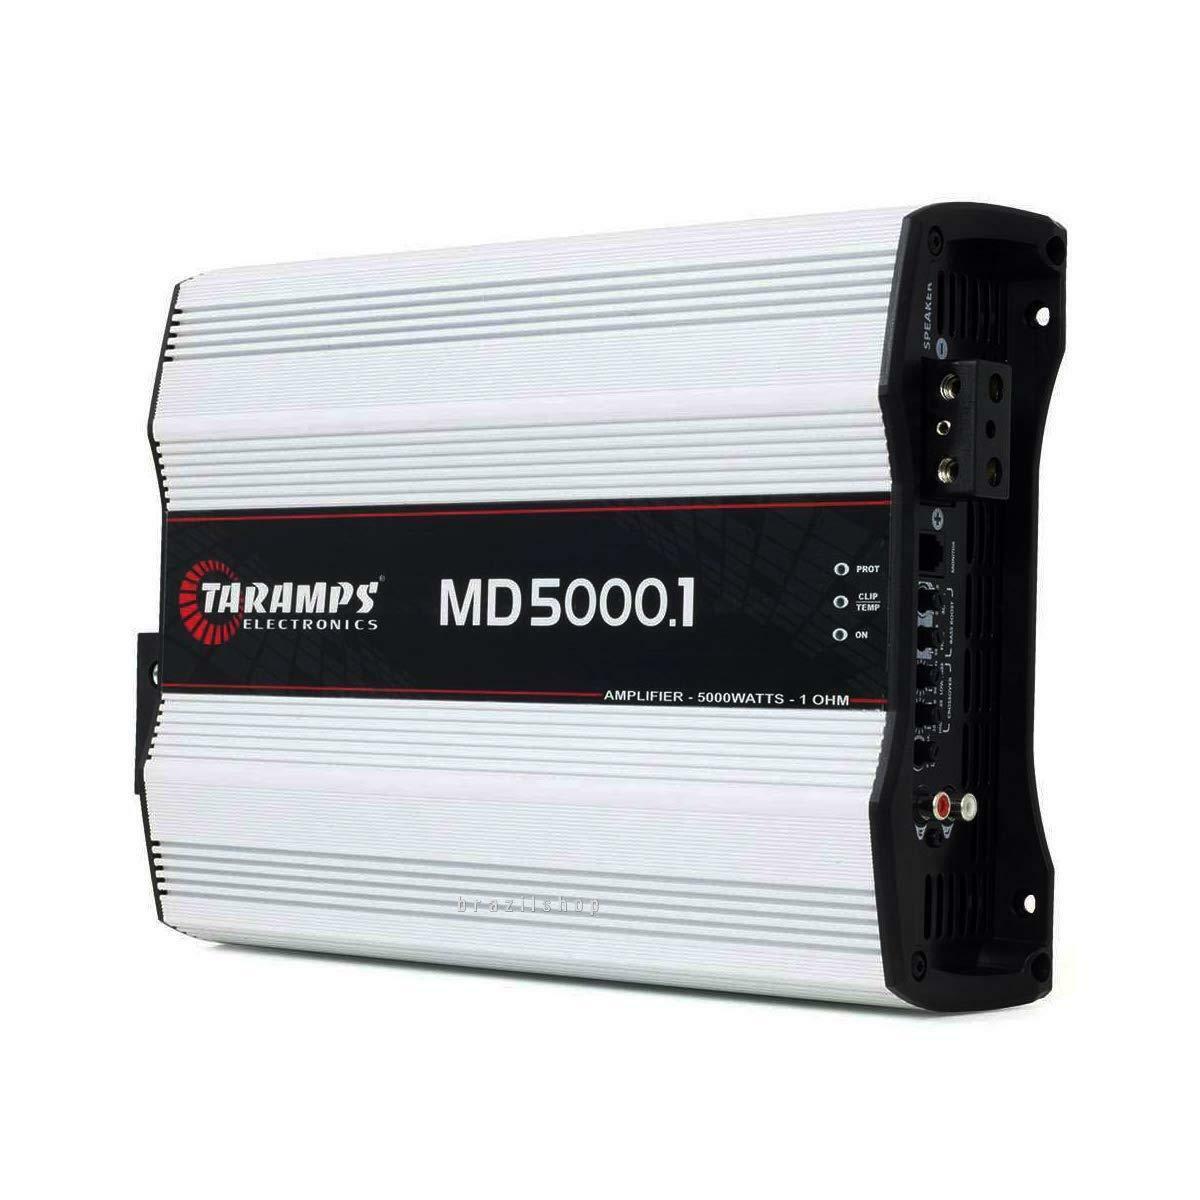 MD5000.1